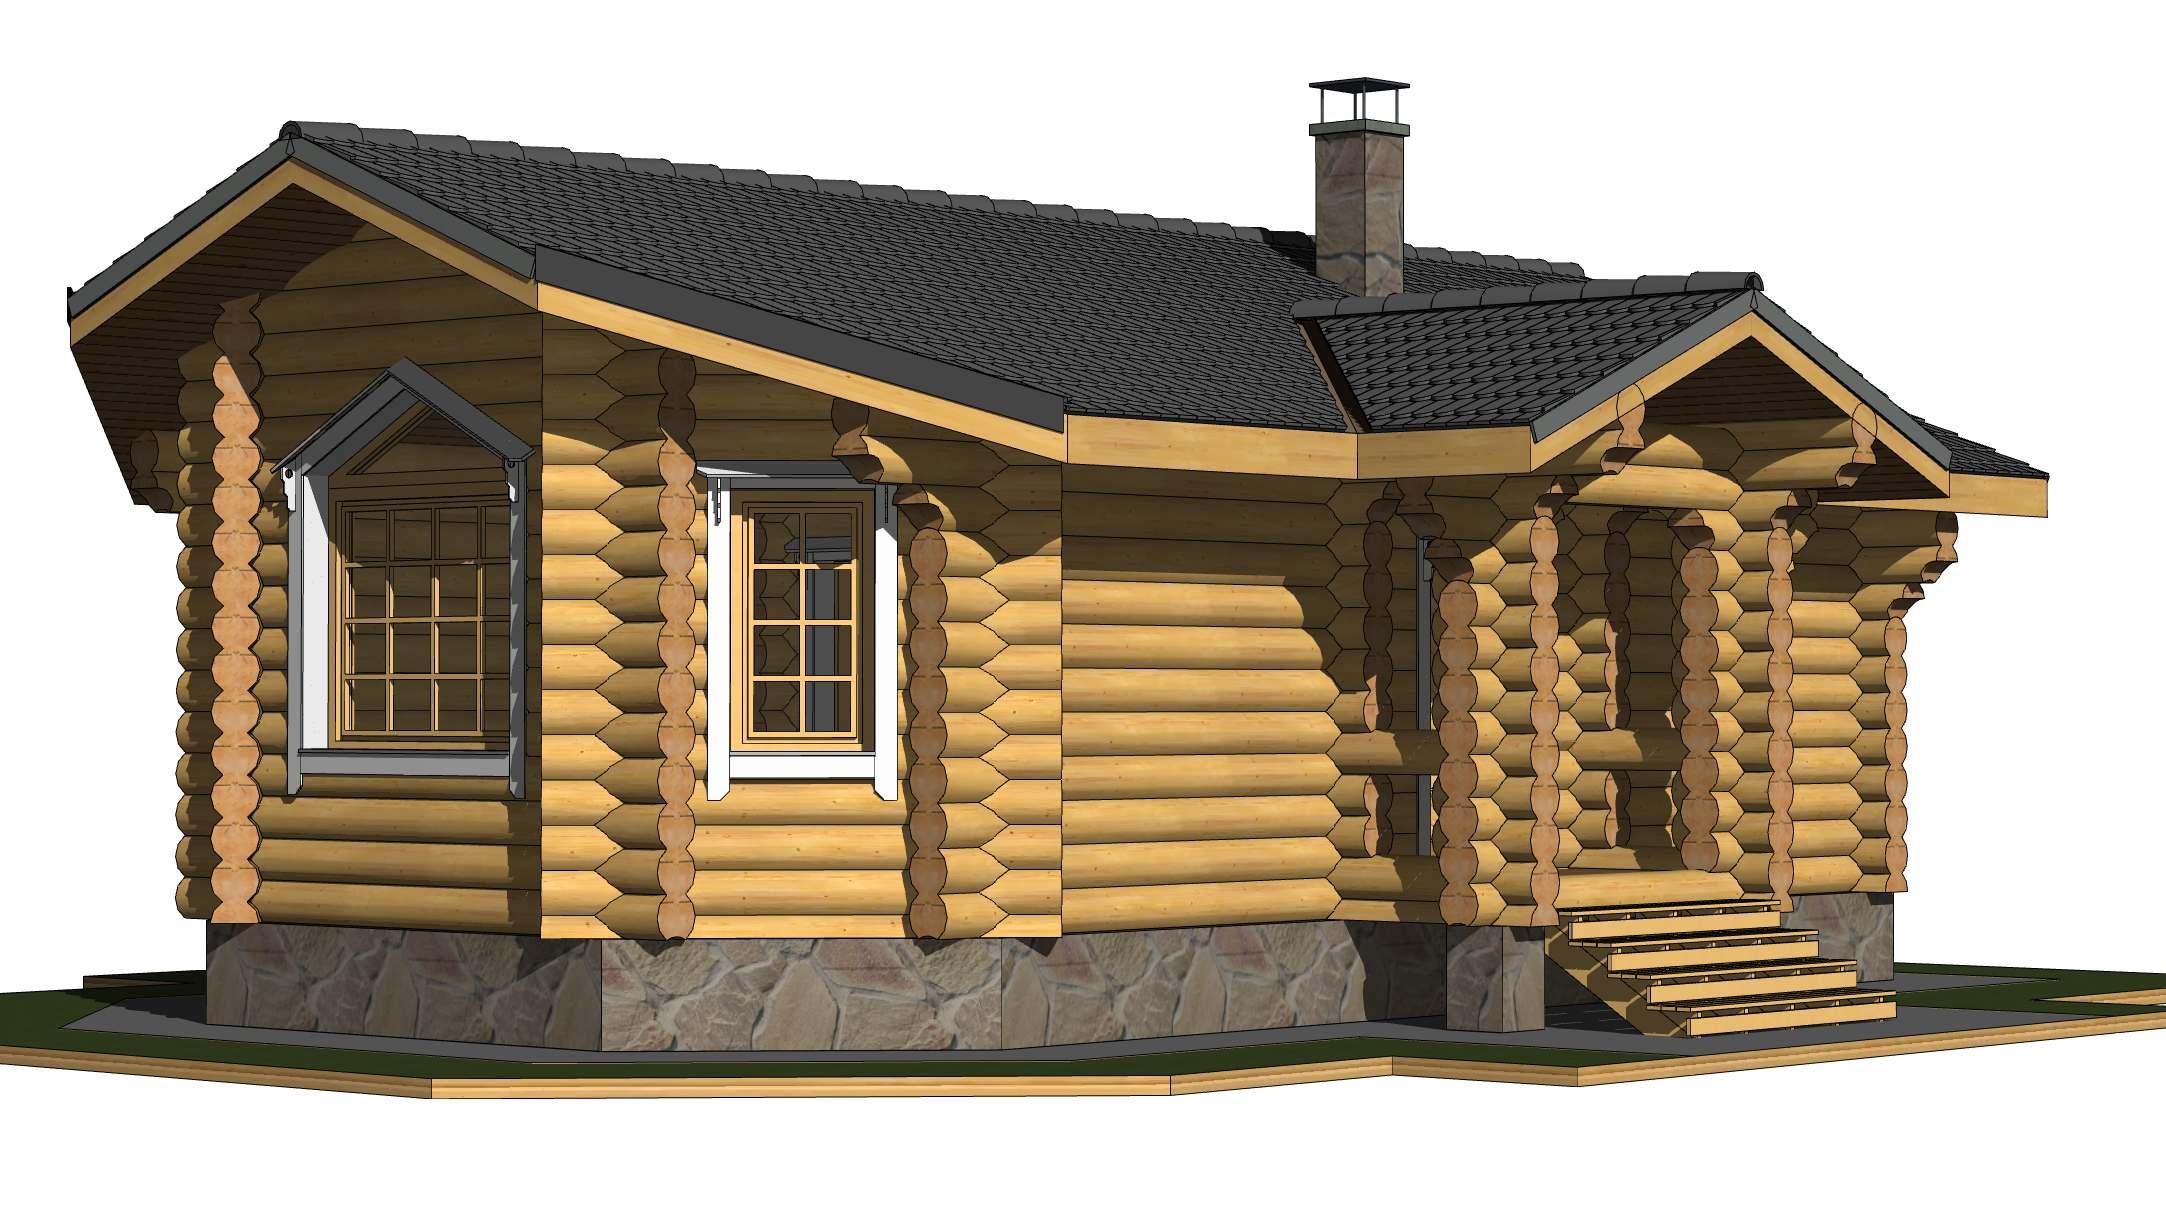 Баня из цилиндрического бревна, особенности материала и проекта баня из цилиндрического бревна, особенности материала и проекта